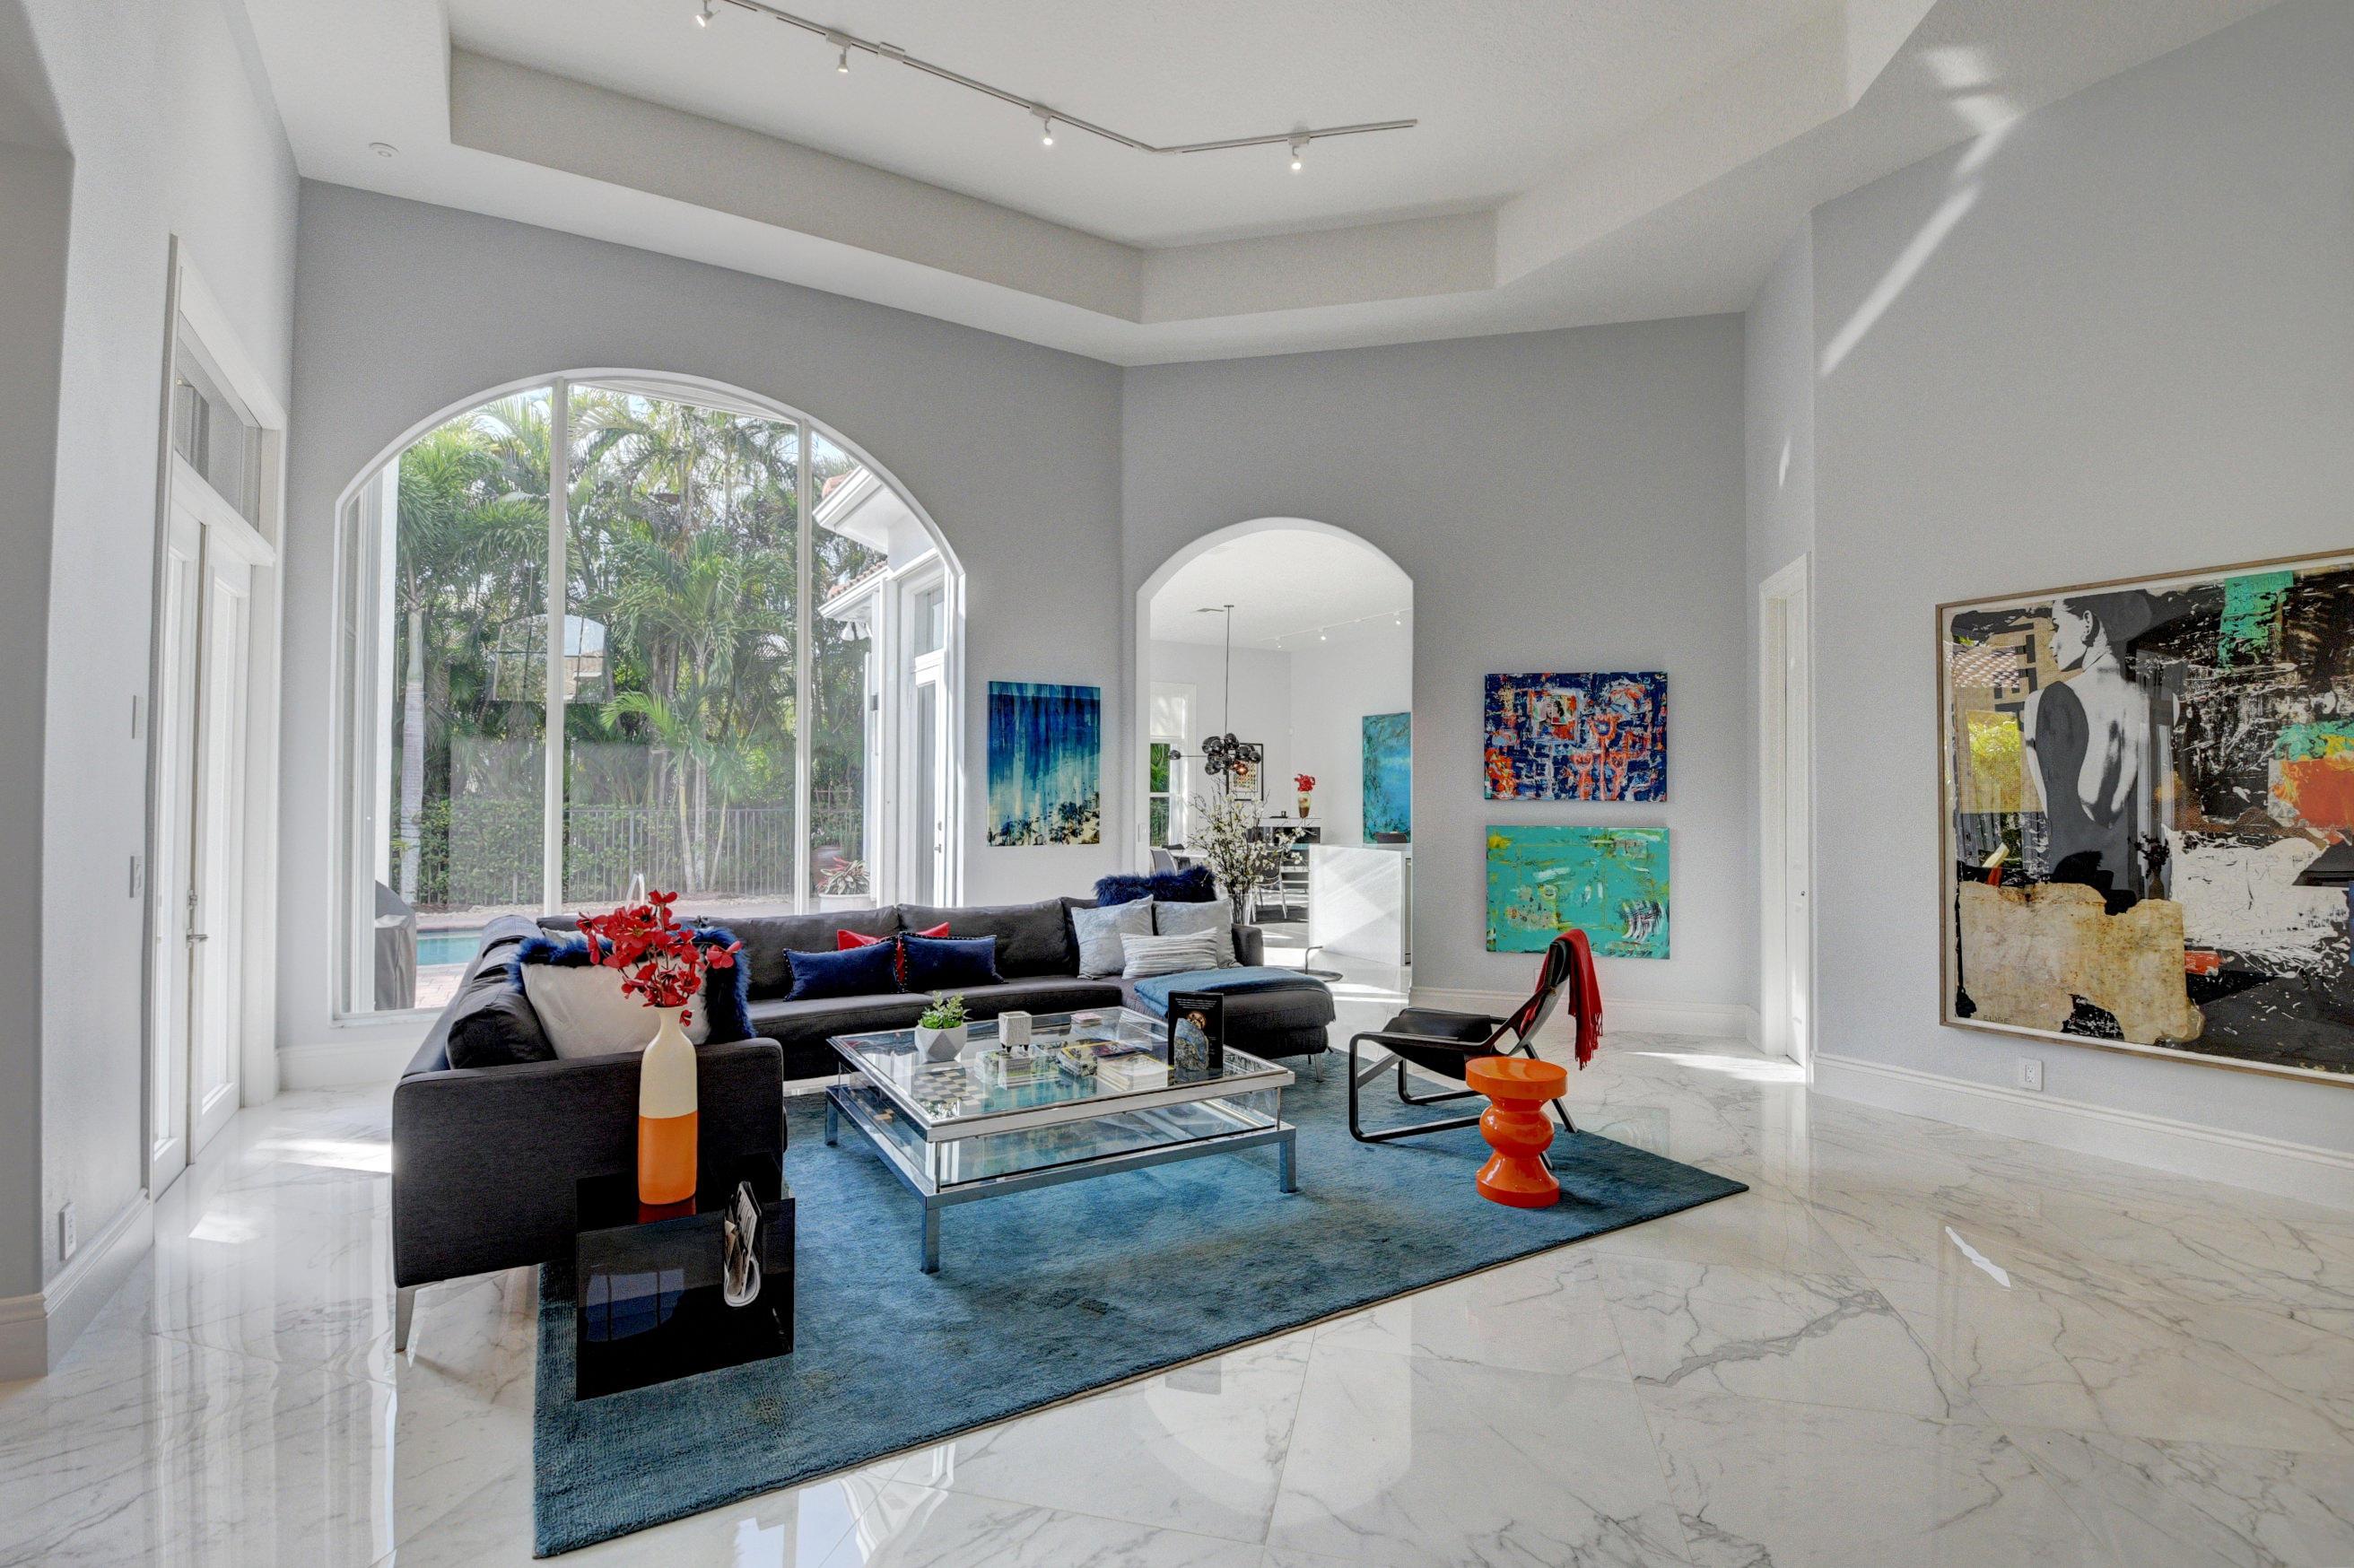 16385 Via Venetia, Delray Beach, Florida 33484, 4 Bedrooms Bedrooms, ,4 BathroomsBathrooms,Single Family,For Sale,MIZNERS PRESERVE,Via Venetia,RX-10499299